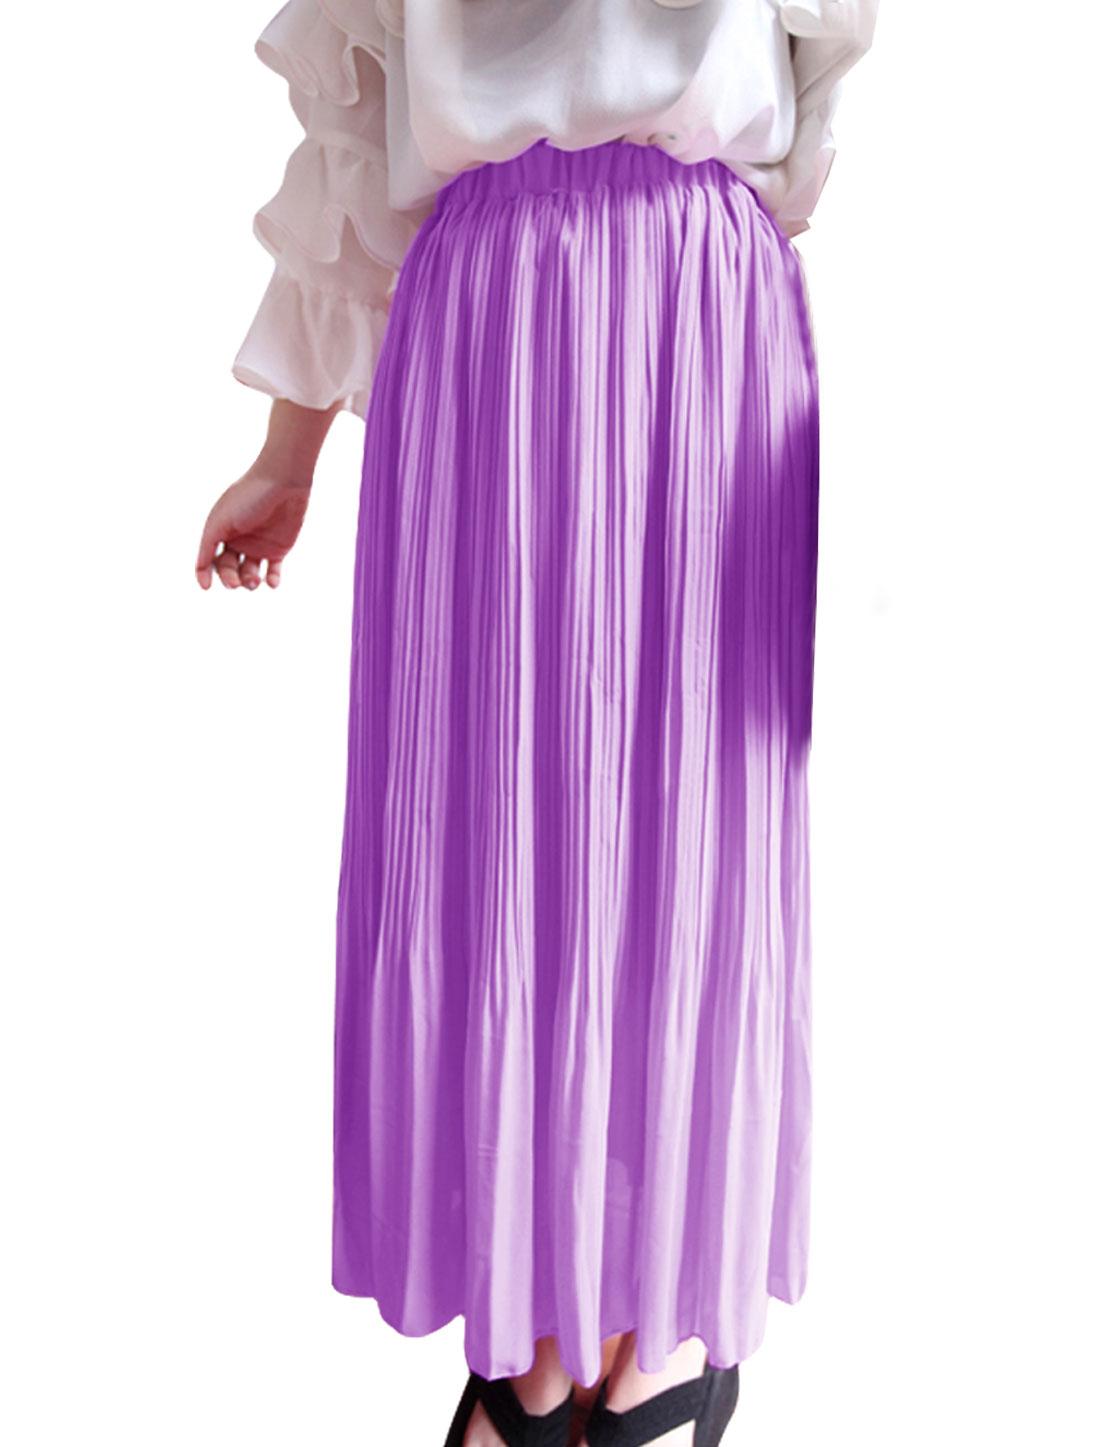 Ladies Elastic Waist Lining Mid Calf Casual Skirt Lilac XS